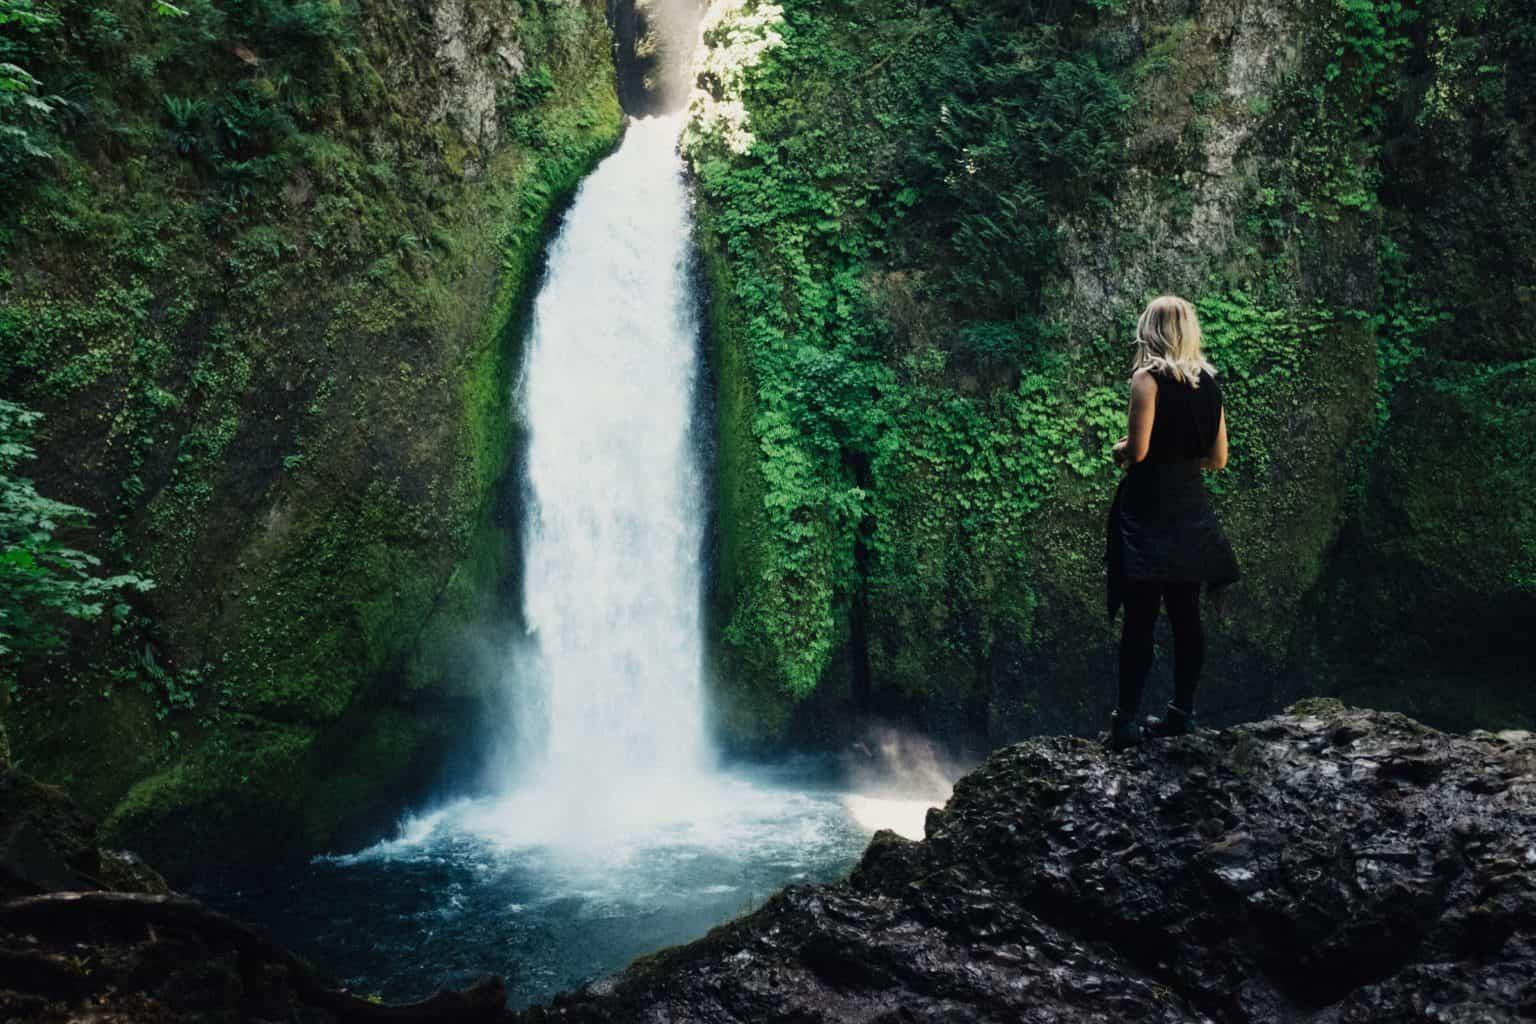 Monte Plata Waterfalls Tour